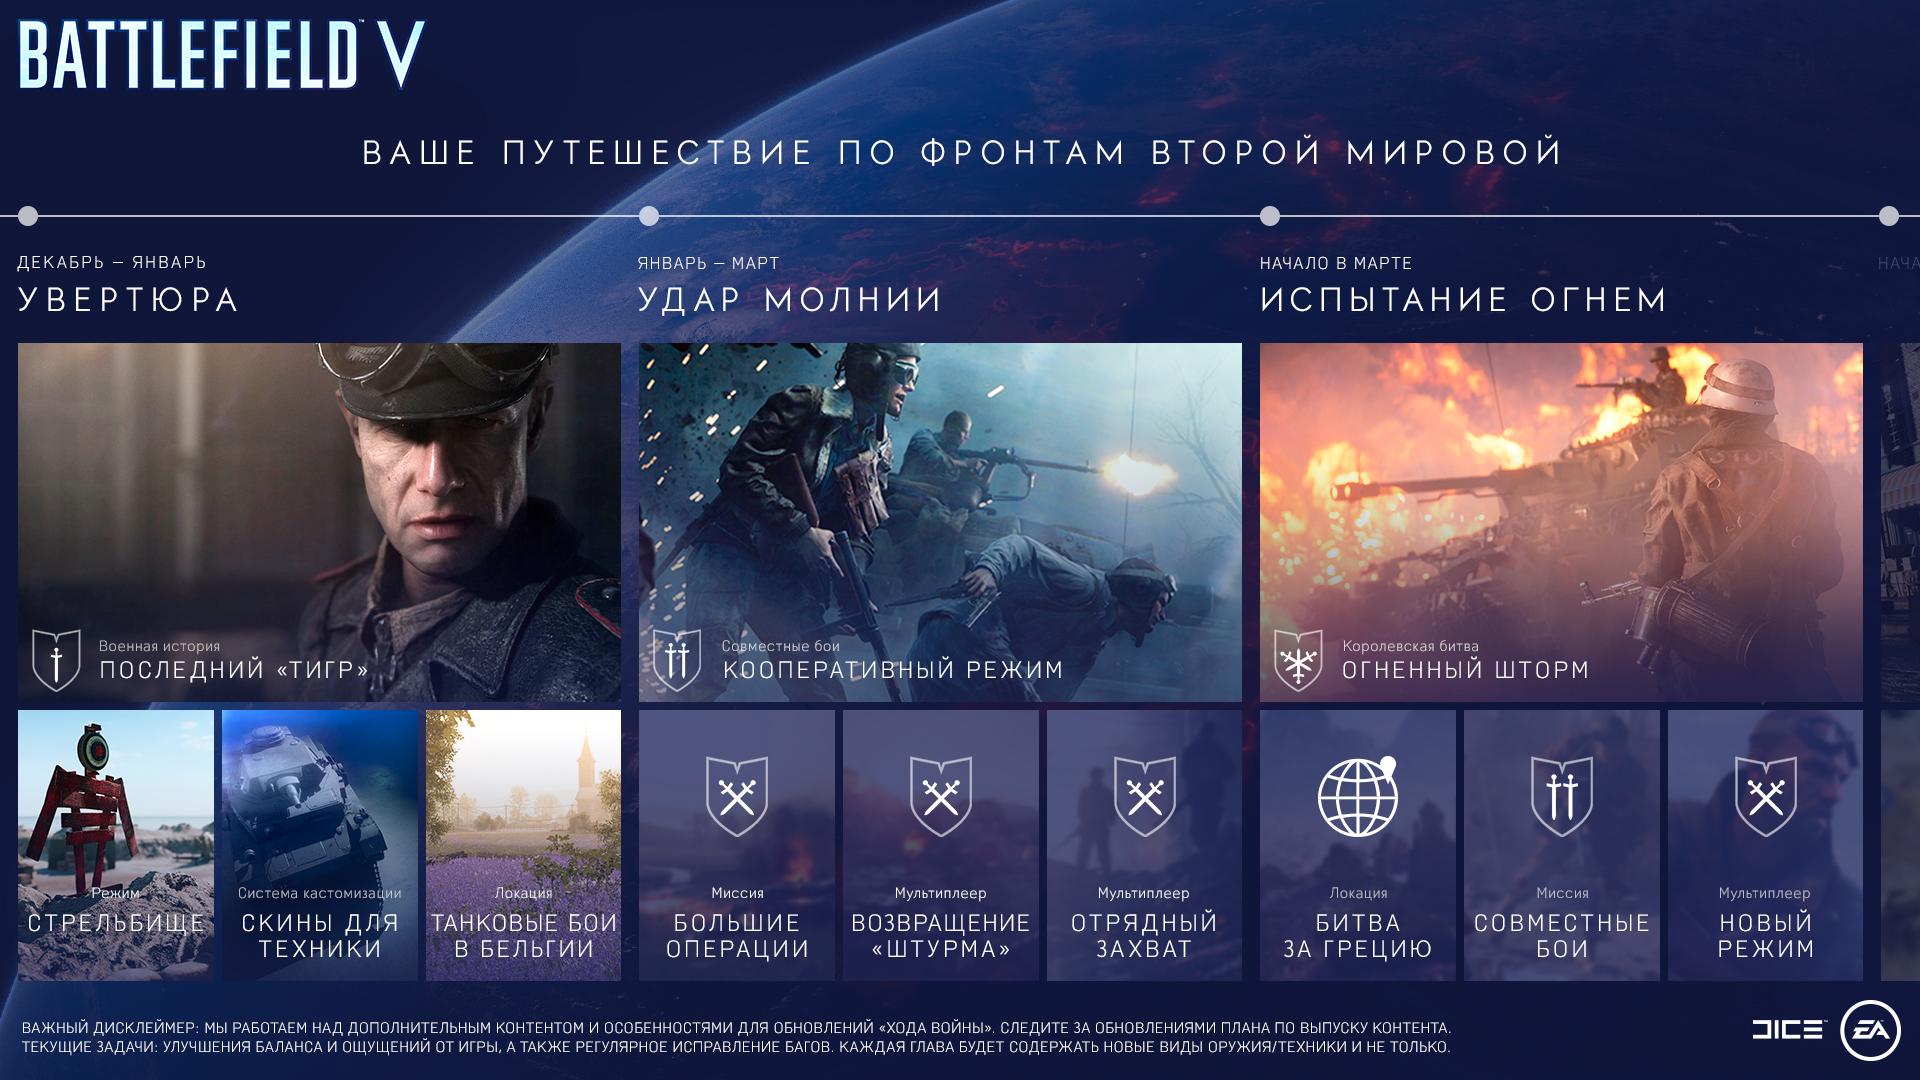 Battlefield 5 – График выхода дополнений